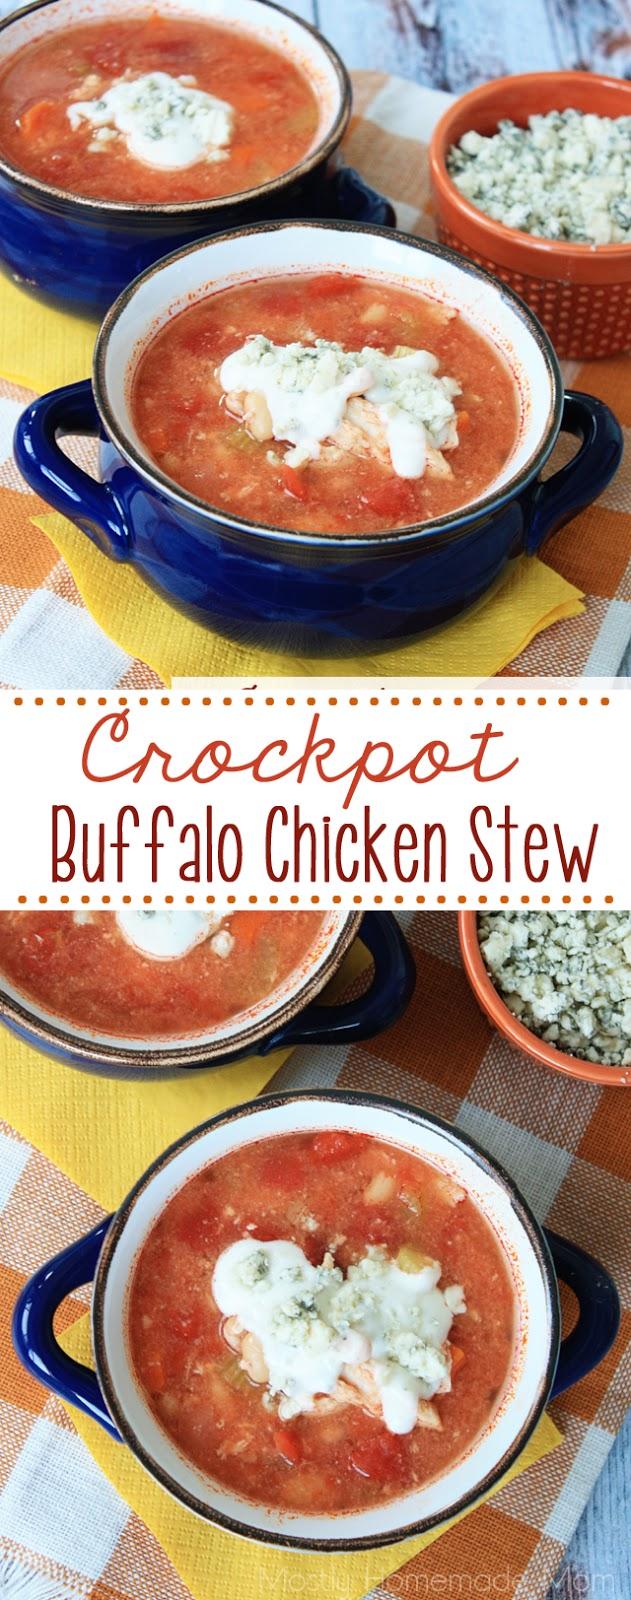 Crockpot Buffalo Chicken Stew